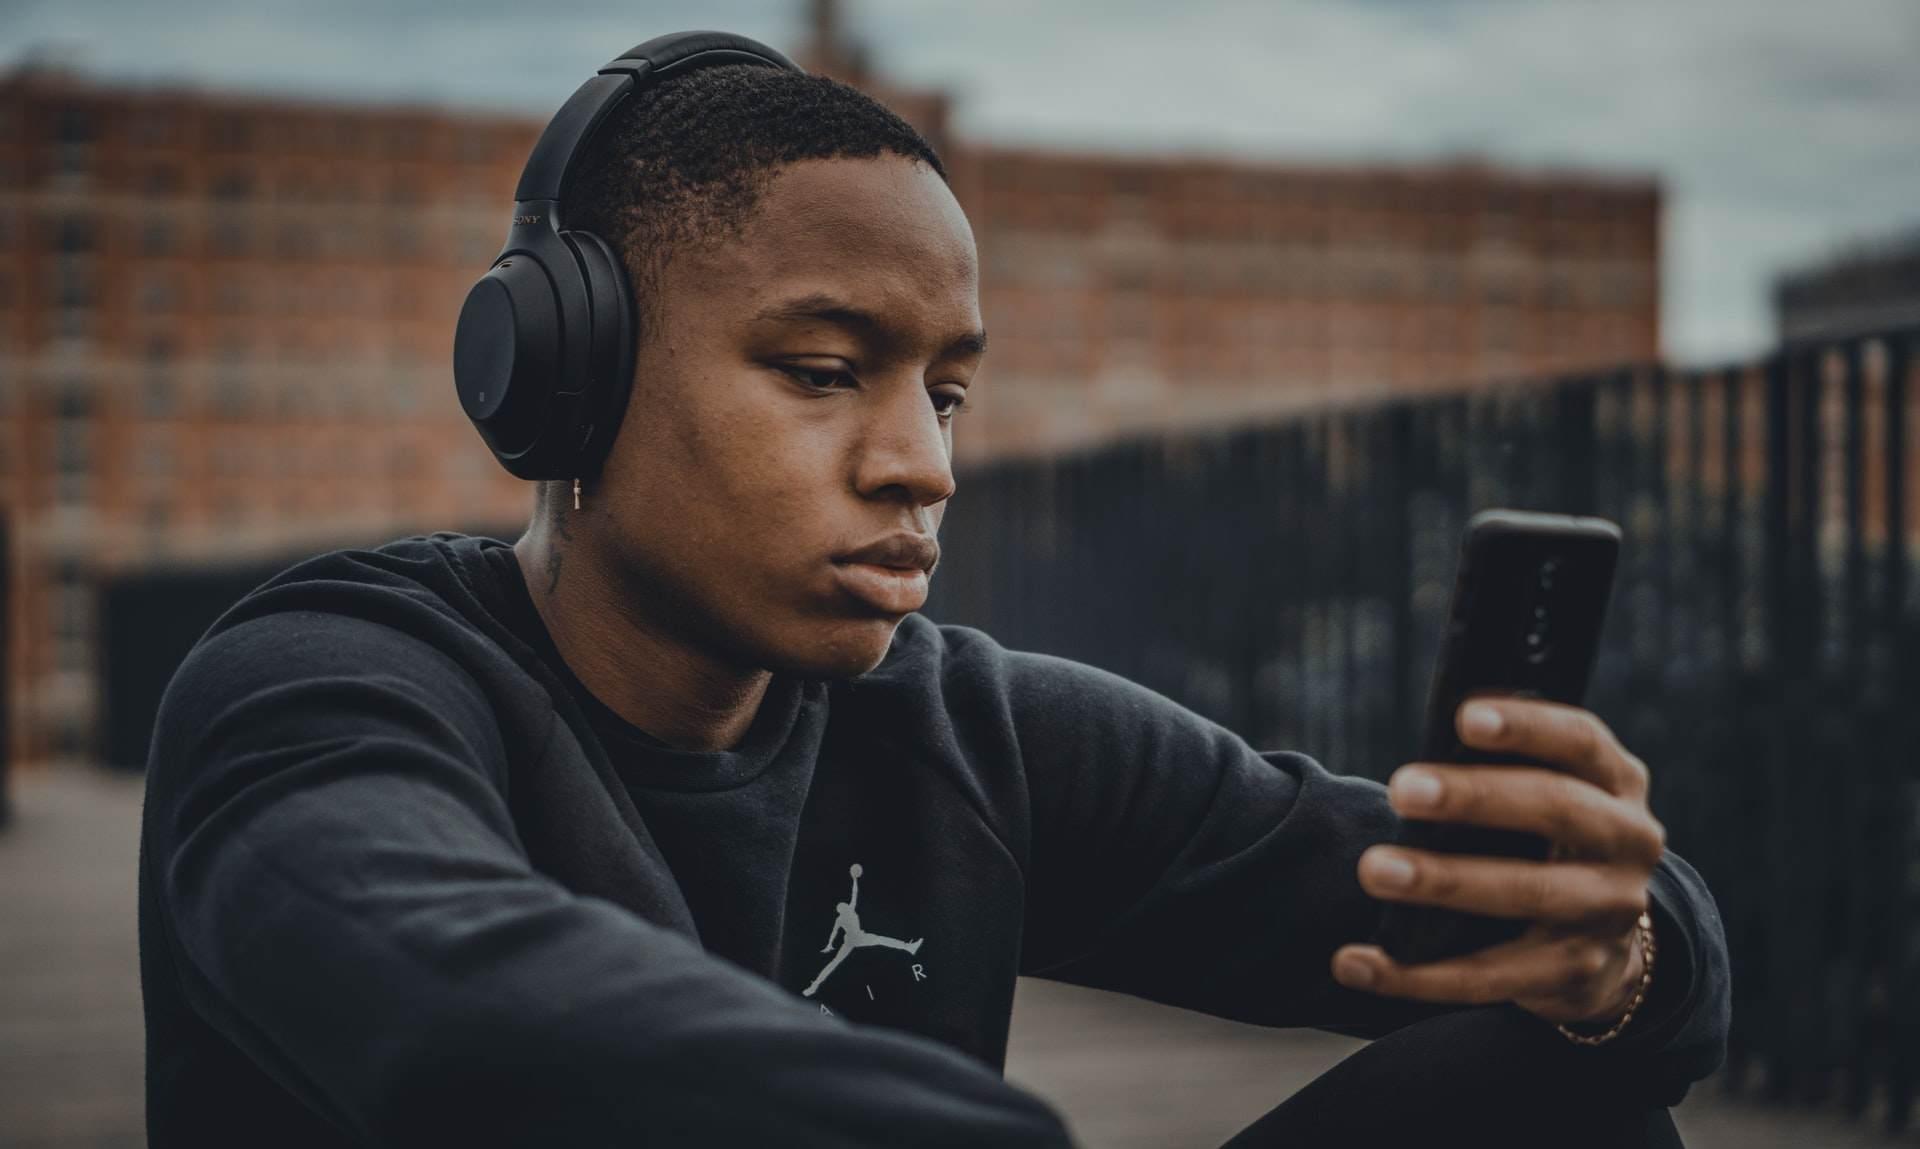 Best Bluetooth Headphones For iPhone 11